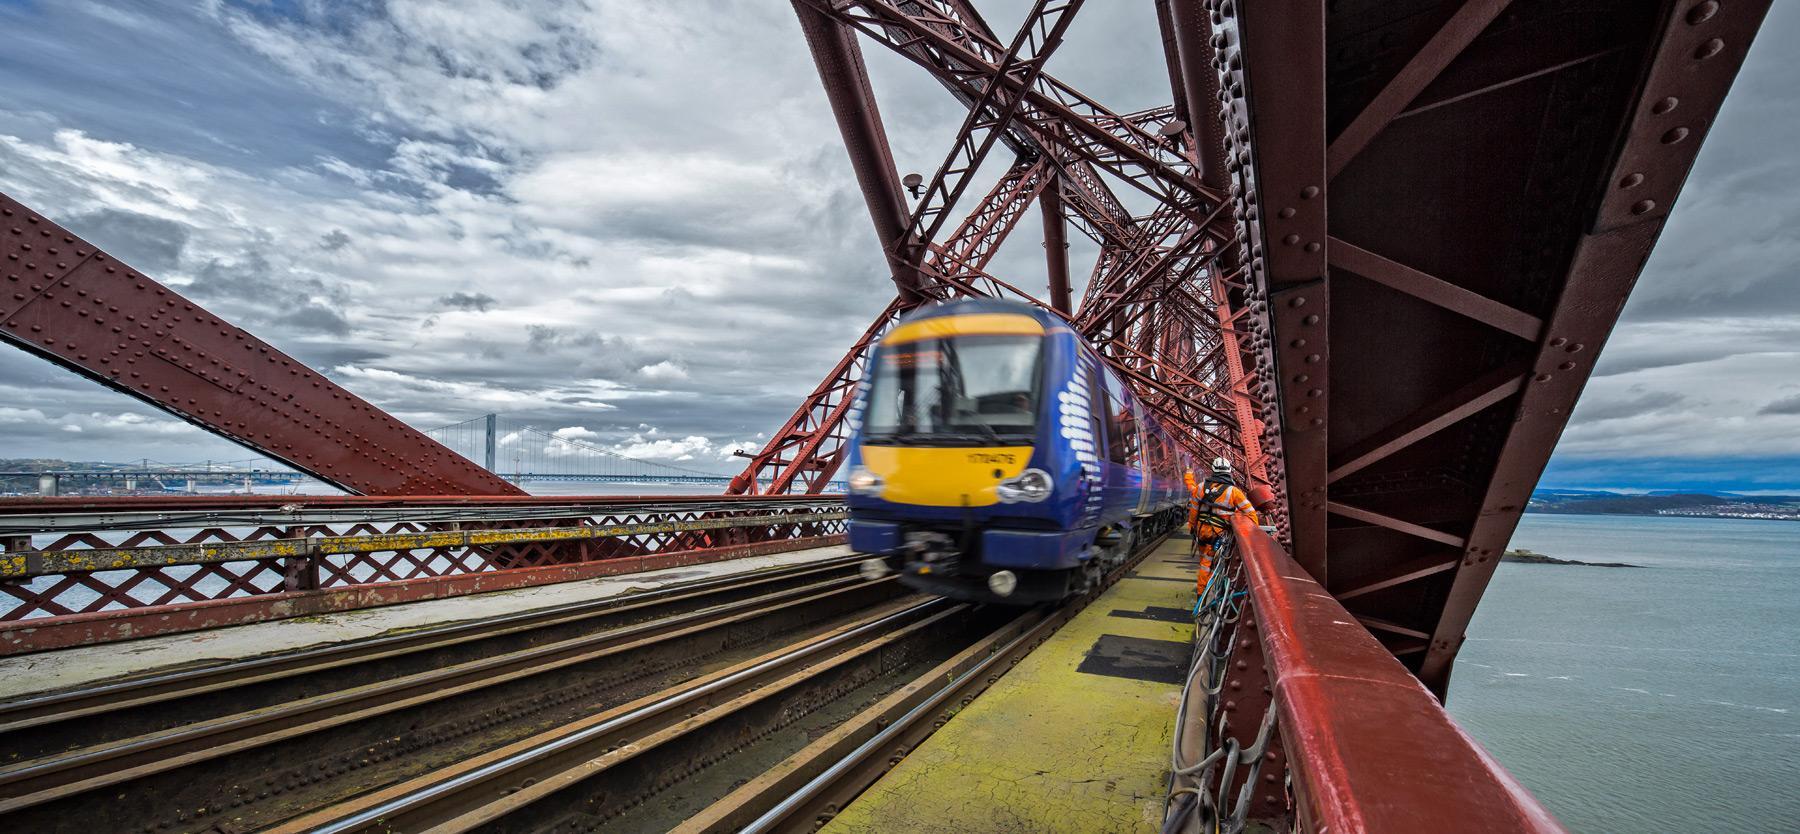 Railway Forth Bridge world heritage site.